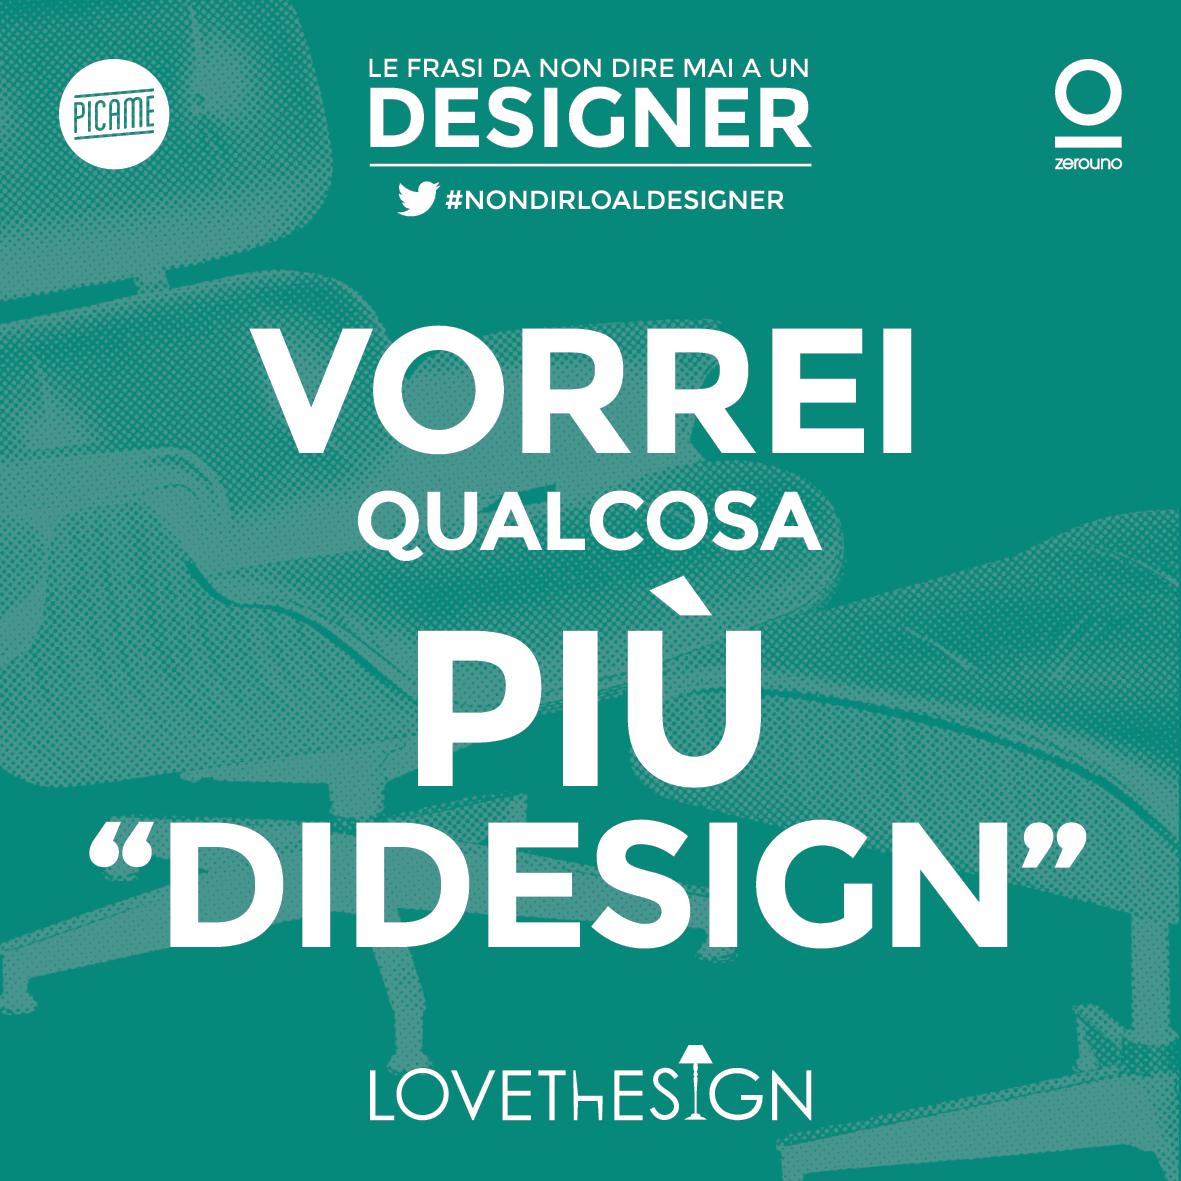 NonDirloalDesigner-Picame-Lovethesign-5